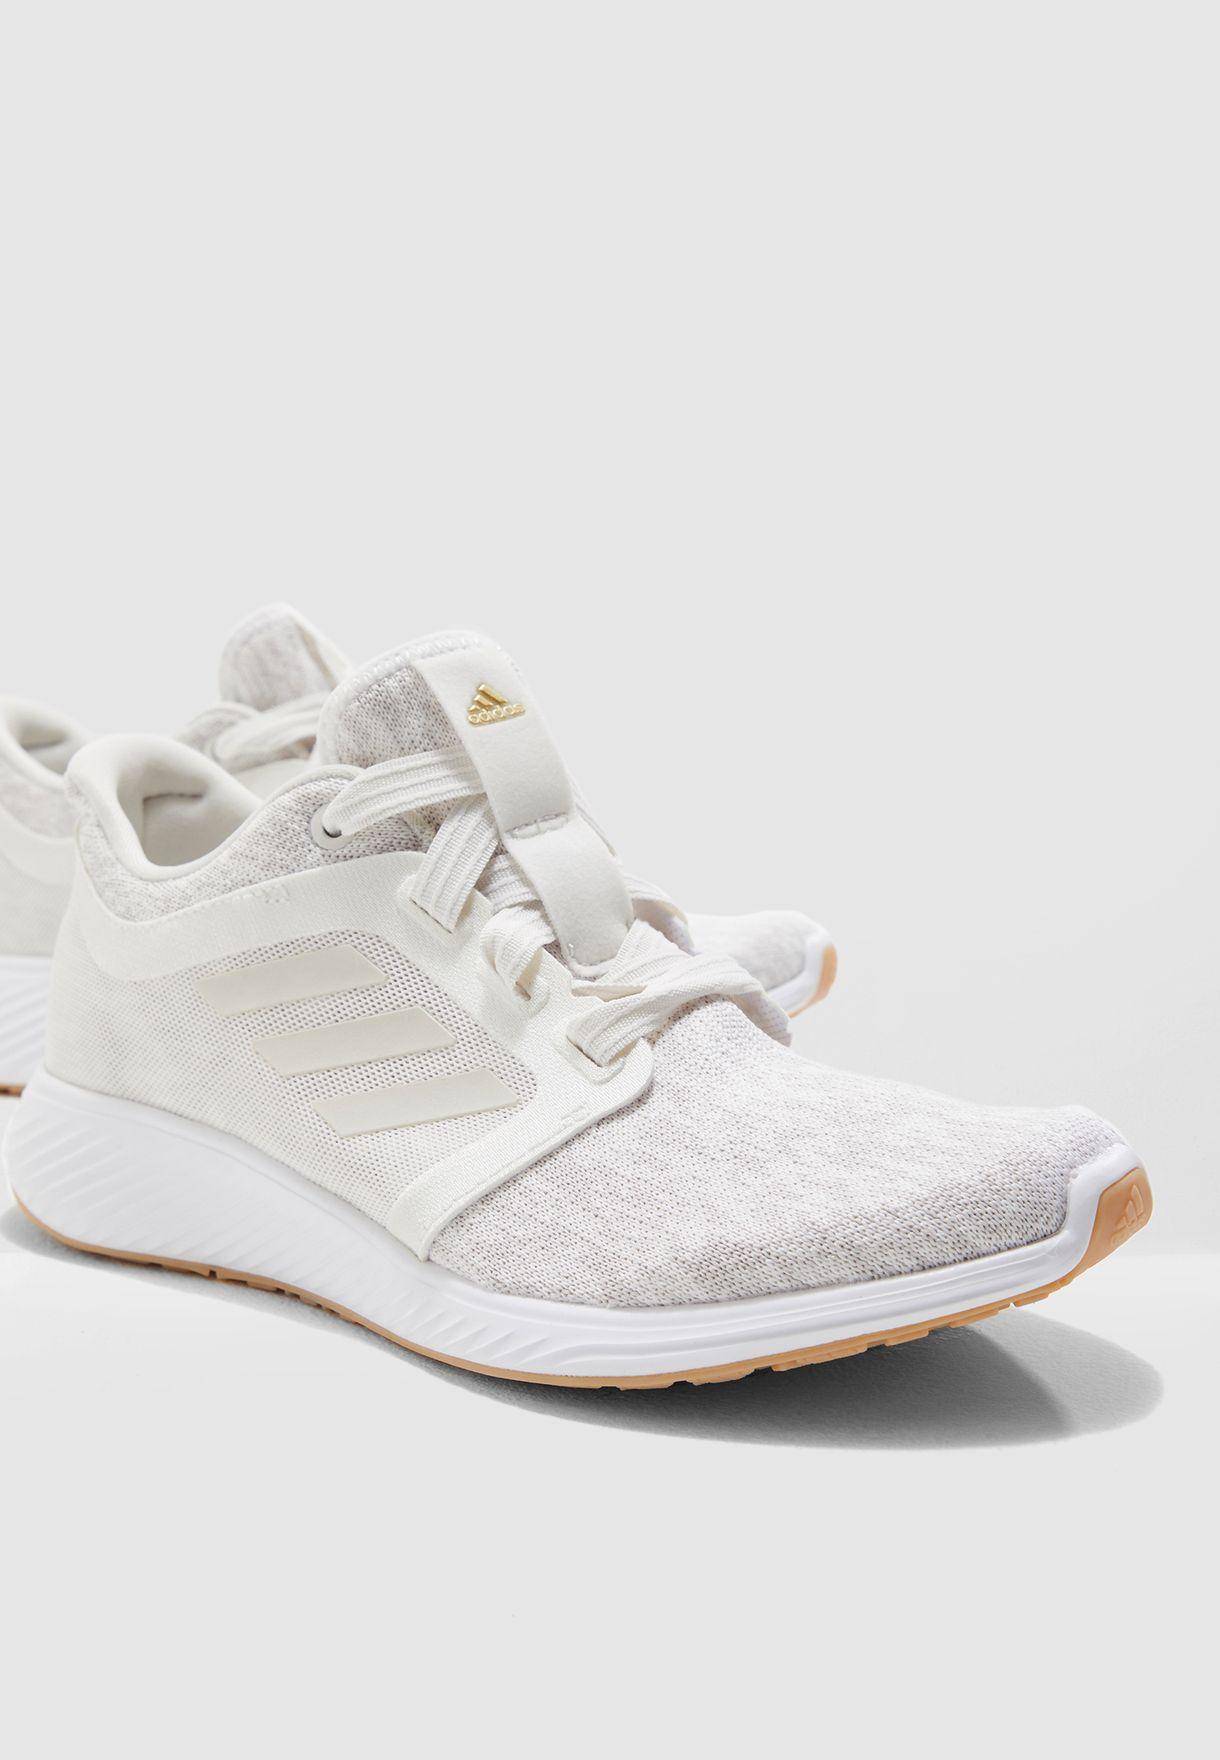 87fb3f6dbefe Shop adidas white Edge Lux 3 D97112 for Women in Qatar - 14448SH71TCP